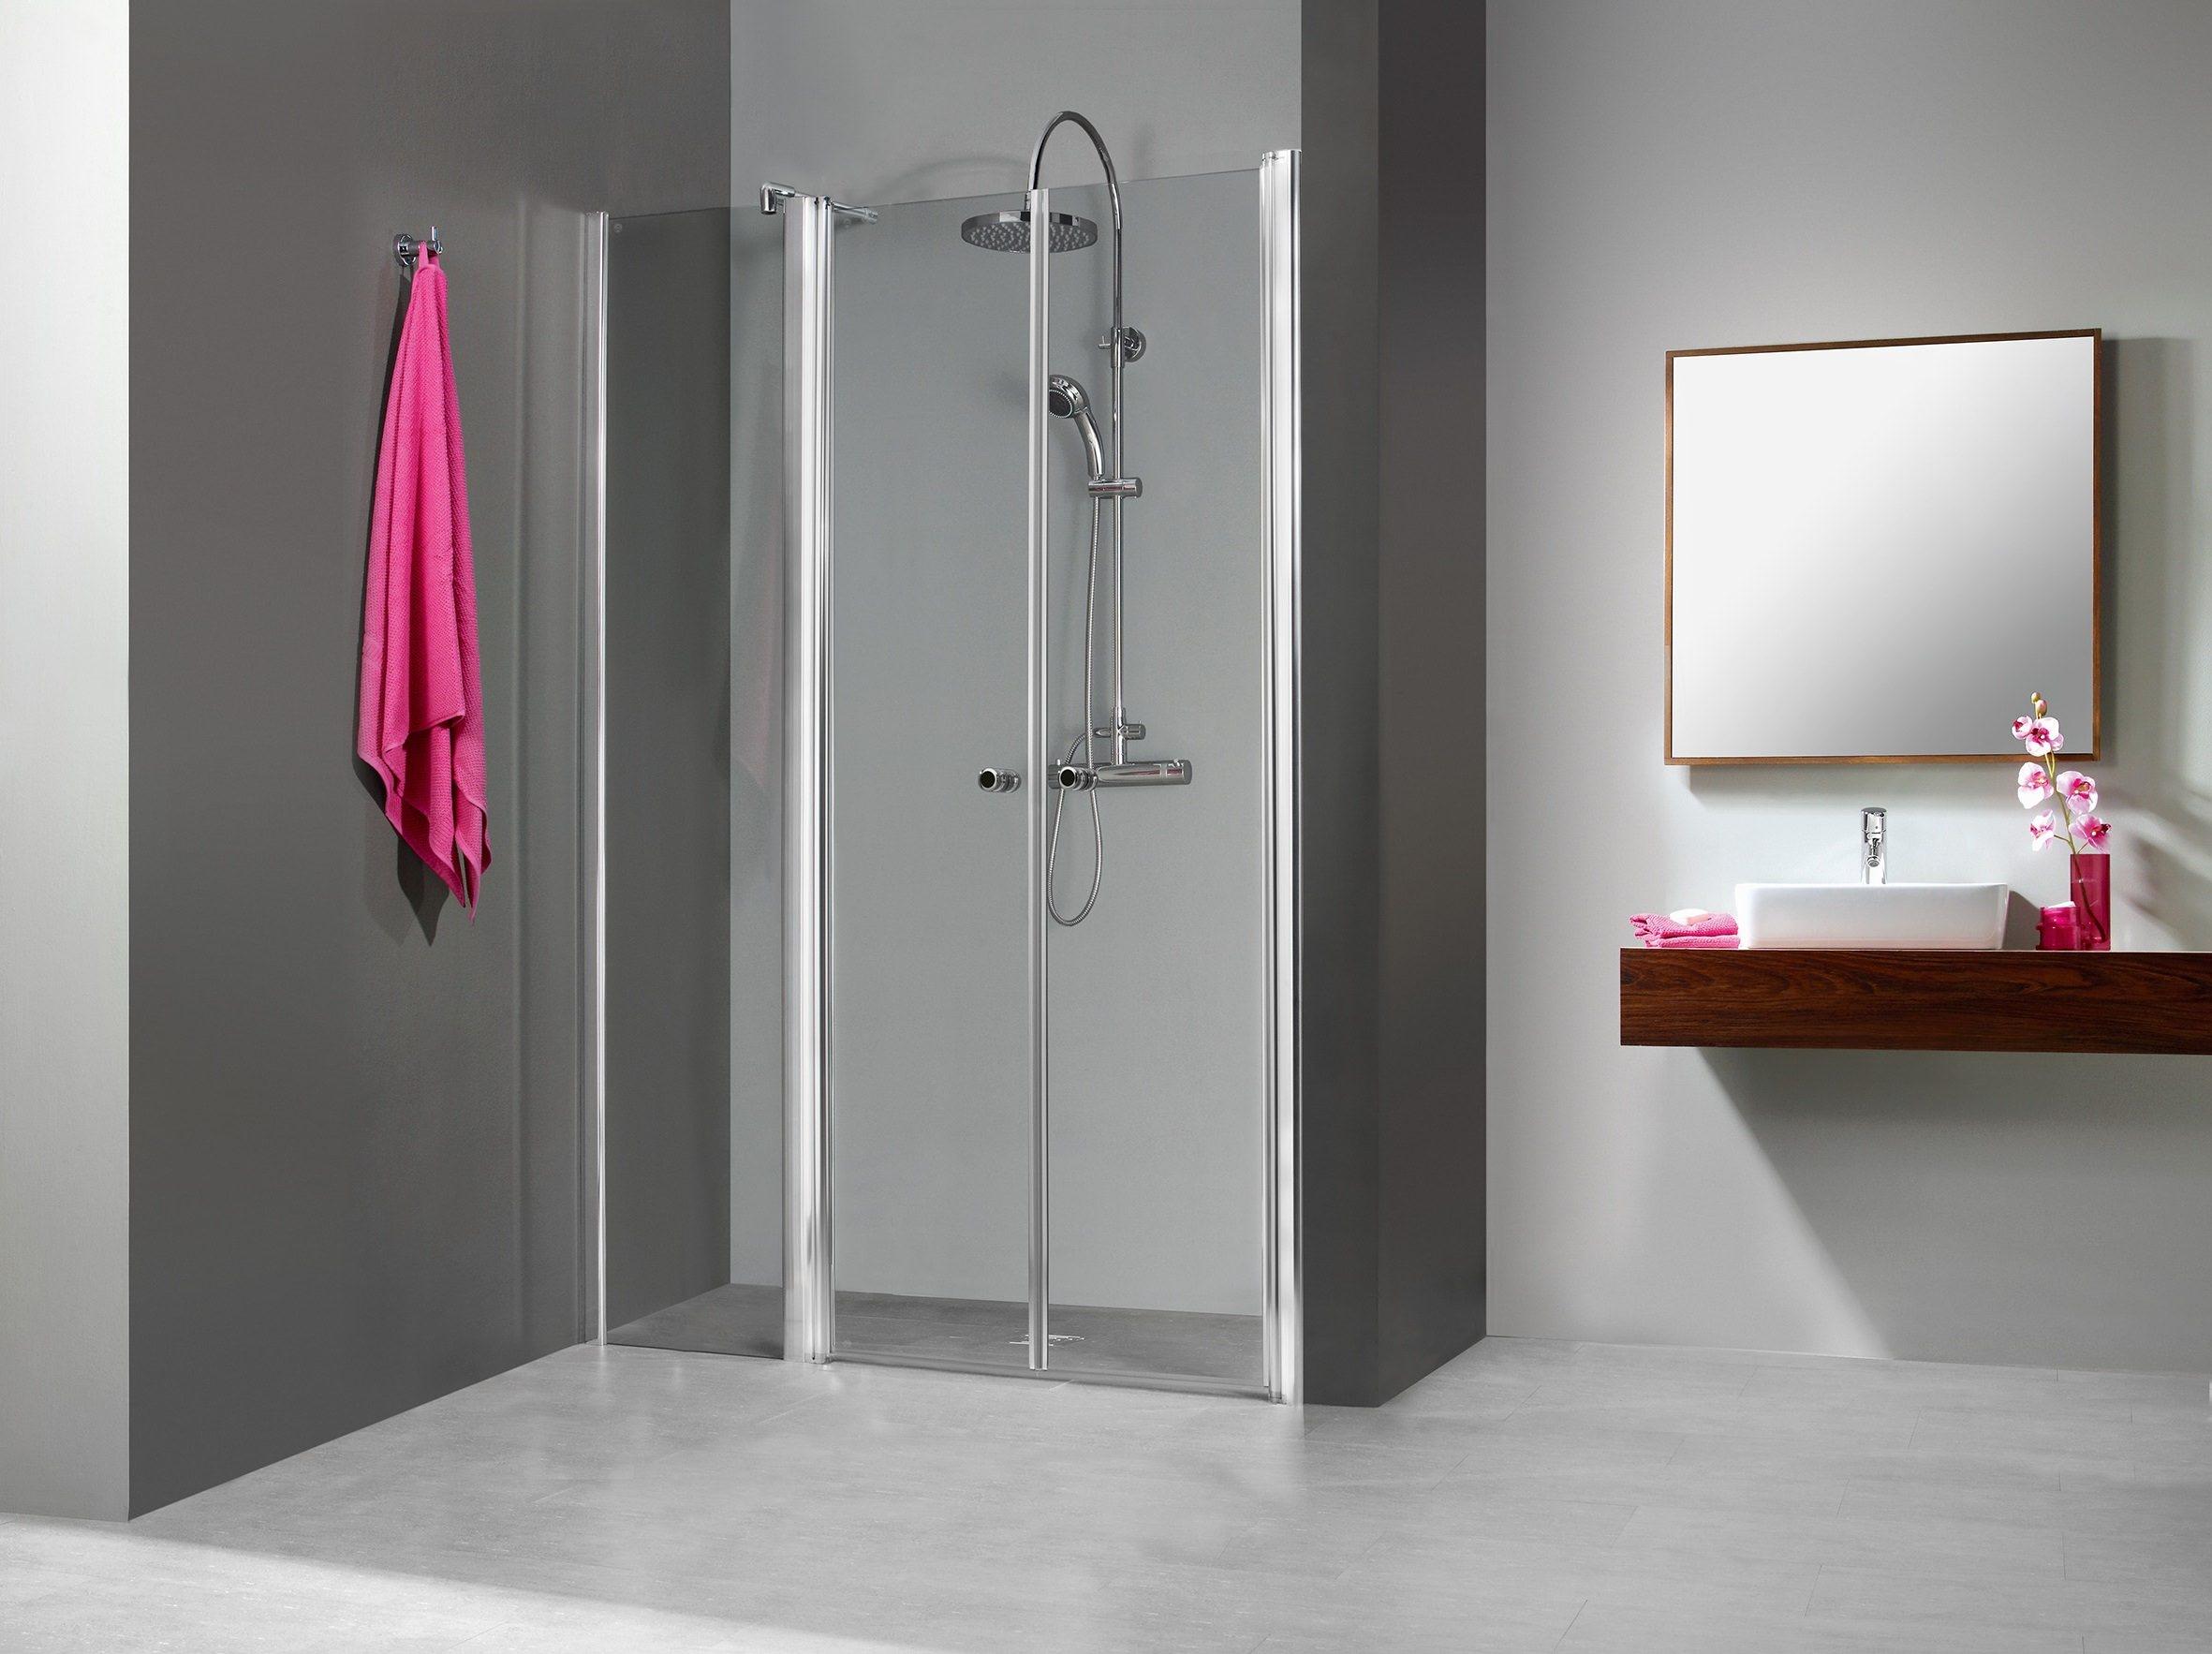 breuer elana 6 pendelt r mit nebenteil f r nische klarglas hell alu silber matt 90cm 200cm. Black Bedroom Furniture Sets. Home Design Ideas